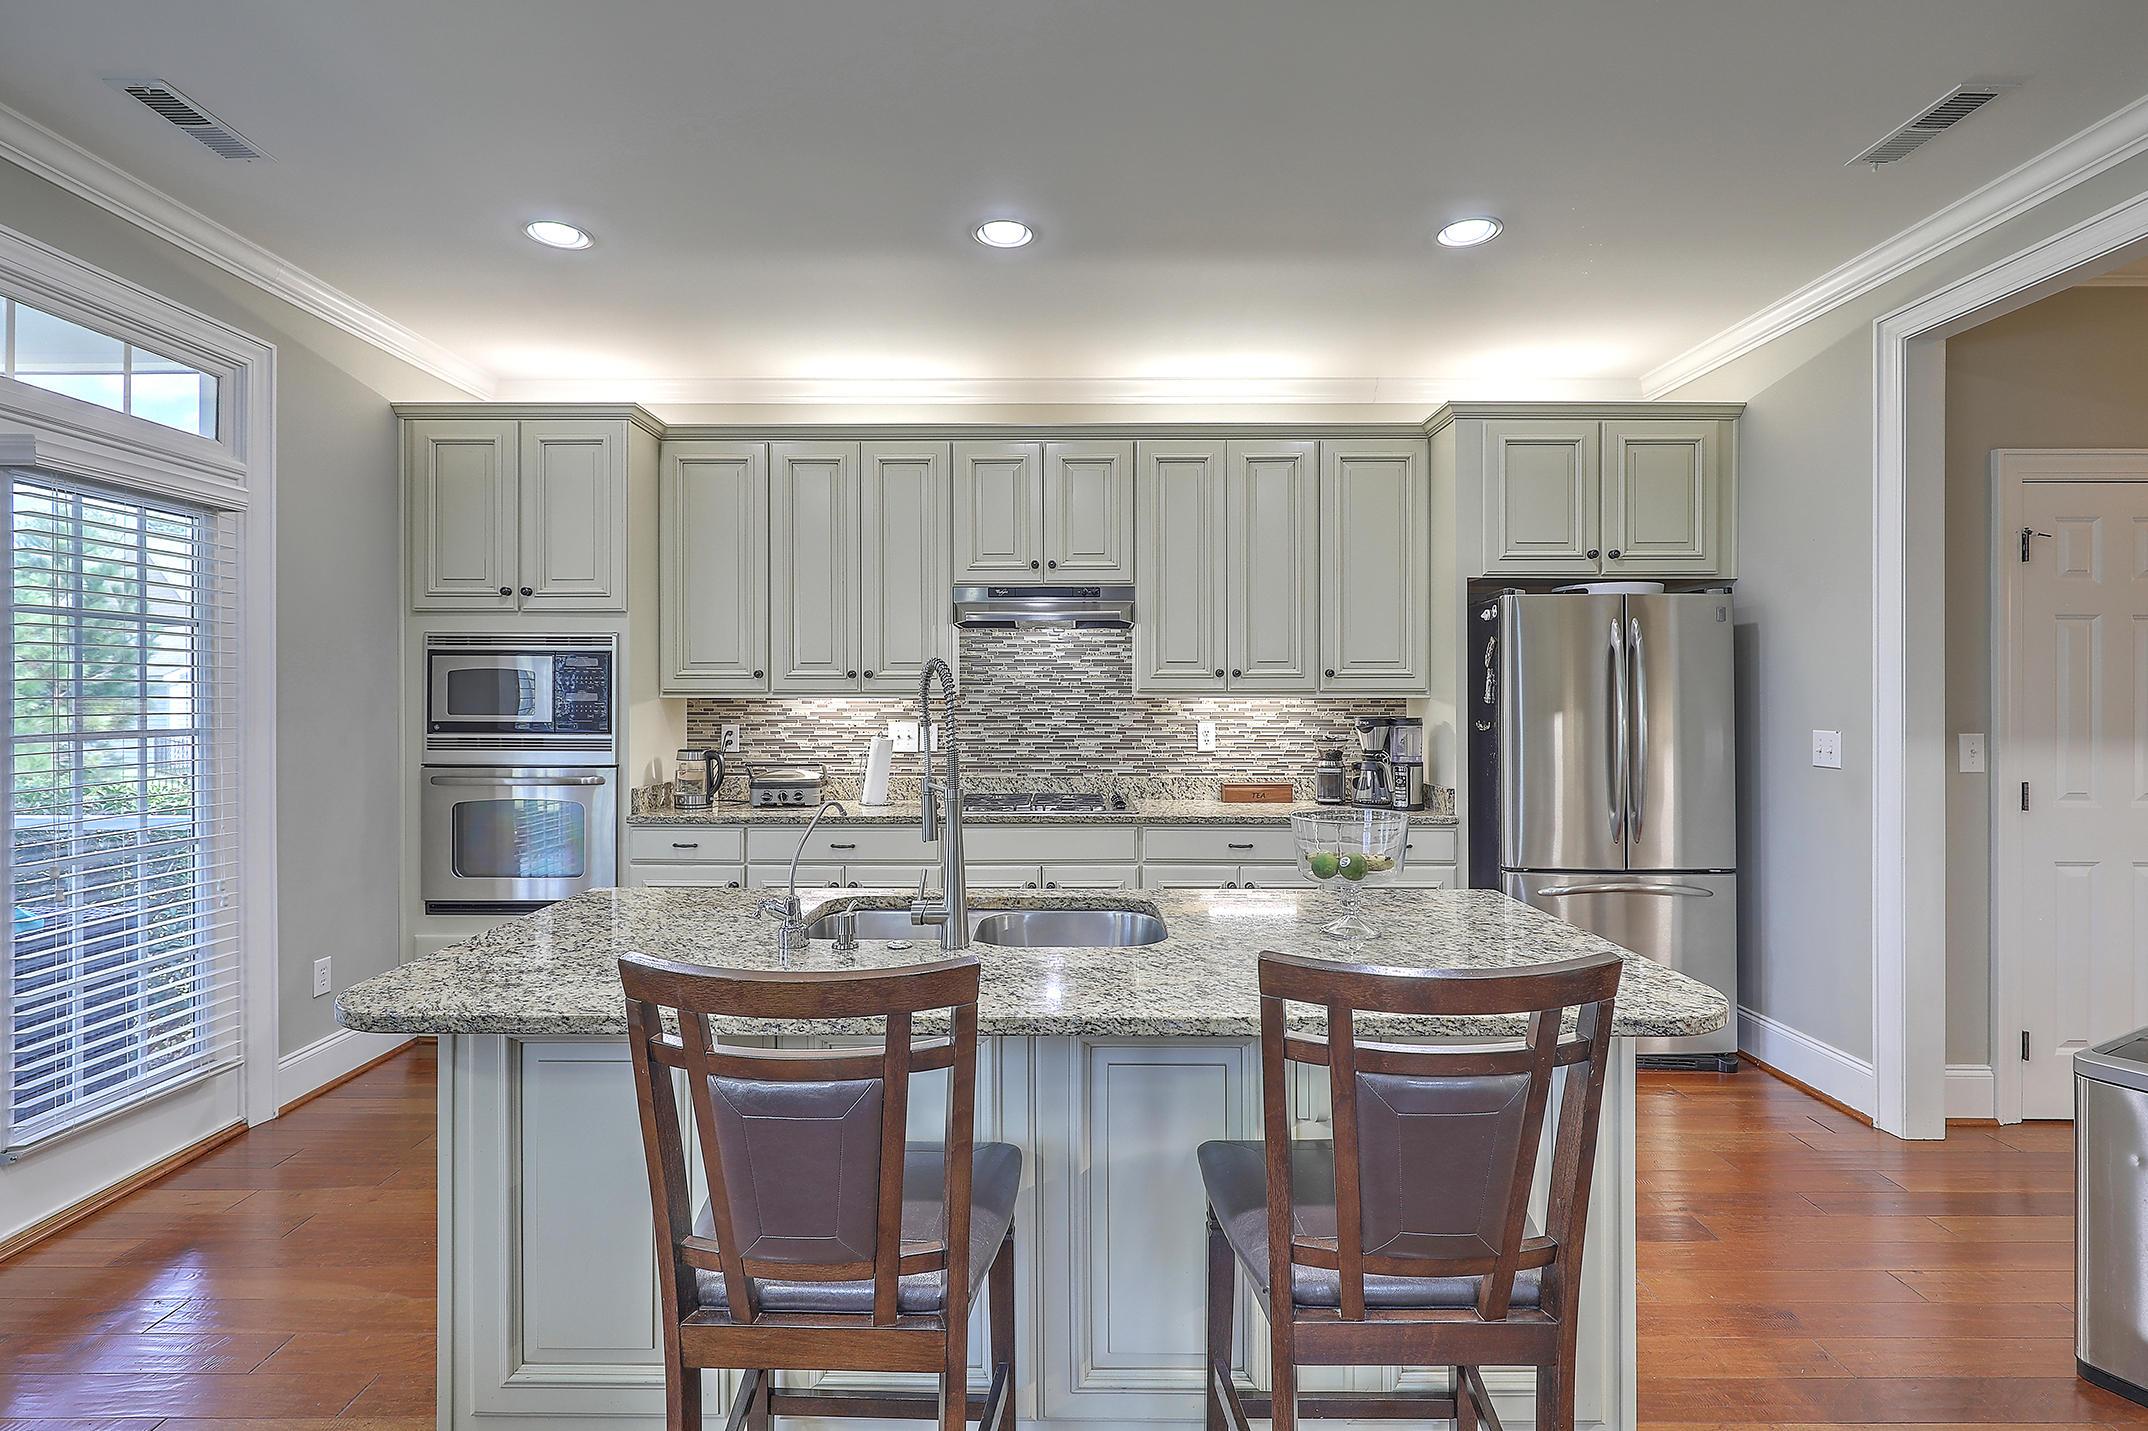 Branch Creek Homes For Sale - 304 Pond Hill, Summerville, SC - 9